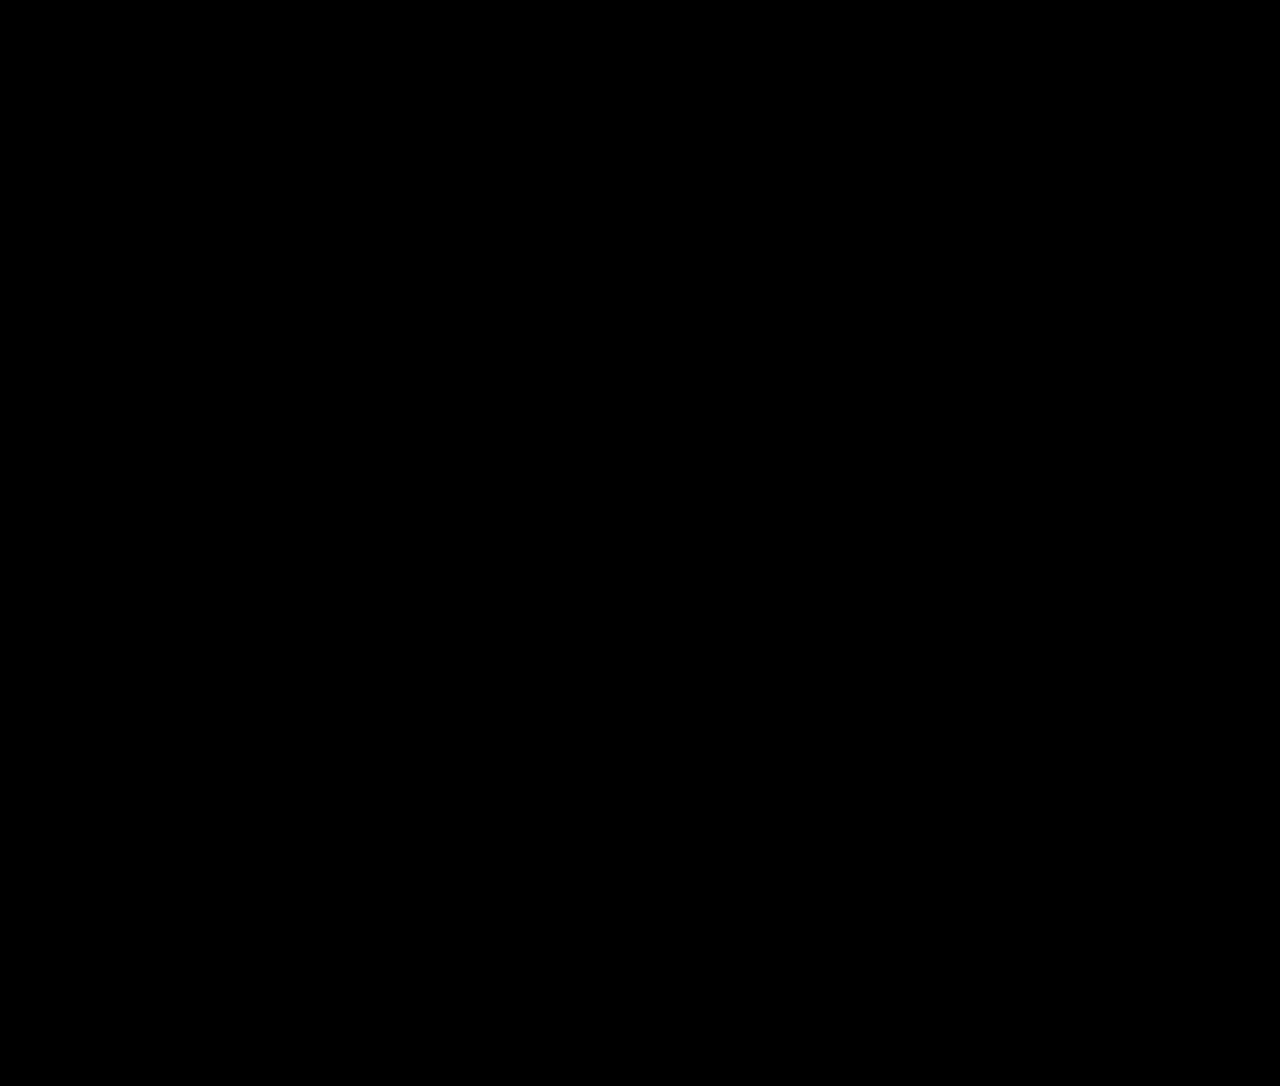 Картинка бриллианта рисунок